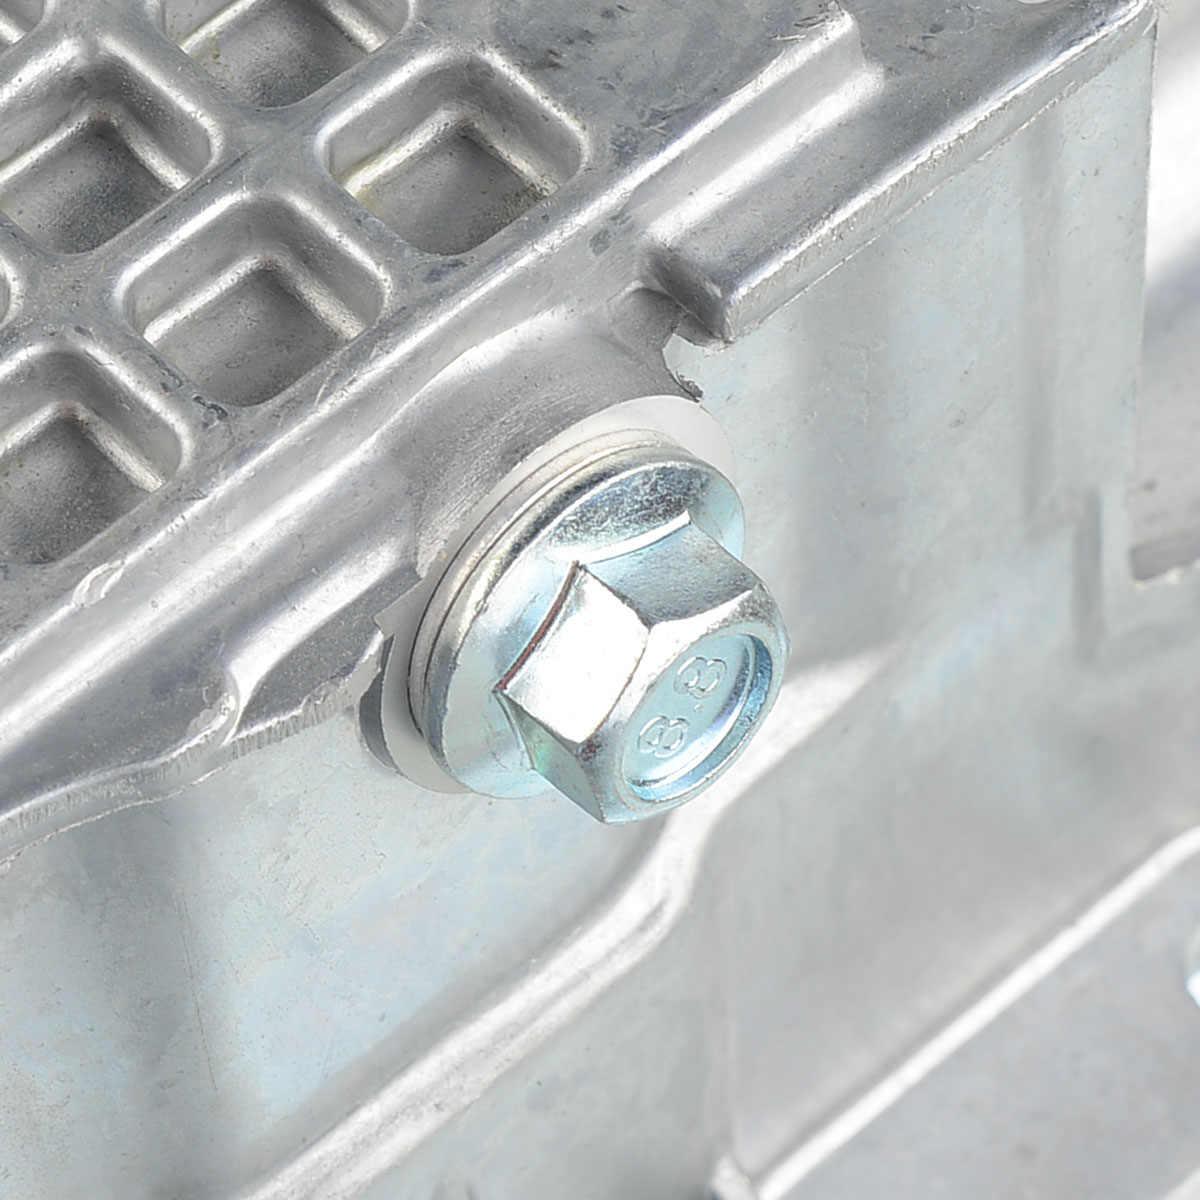 engine oil pan for ford escape cougar mariner mazda 6 mpv tribute v6 2 5l 3 0 [ 1200 x 1200 Pixel ]